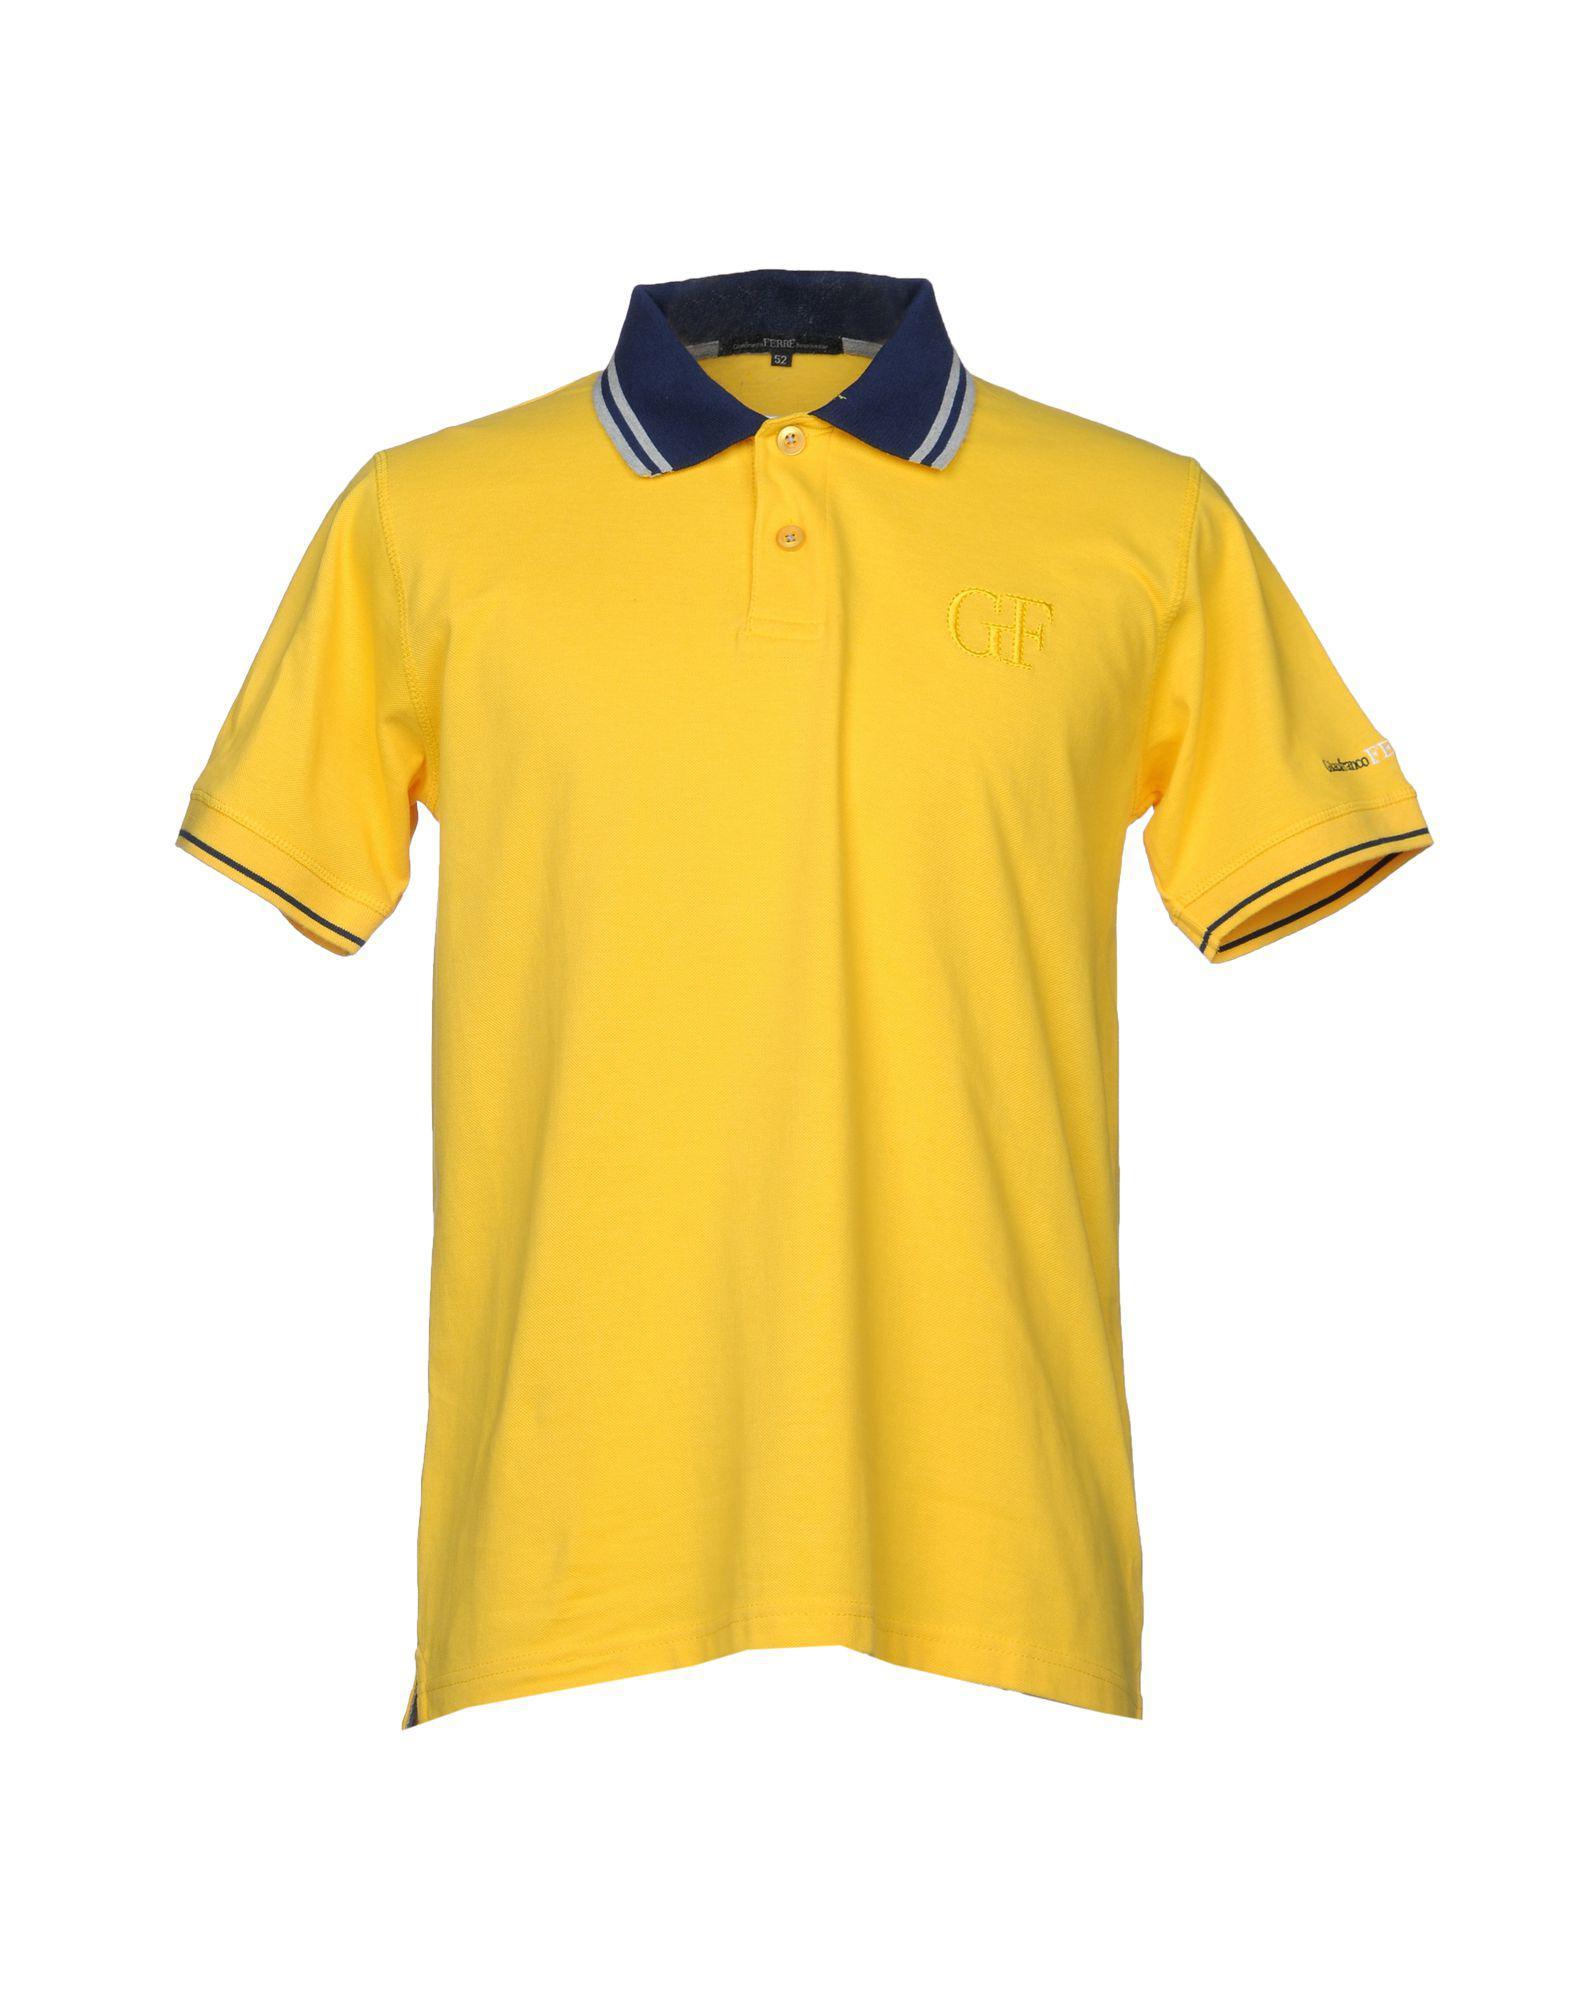 Polo Shirt for Men, Yellow, Cotton, 2017, M S Jeckerson